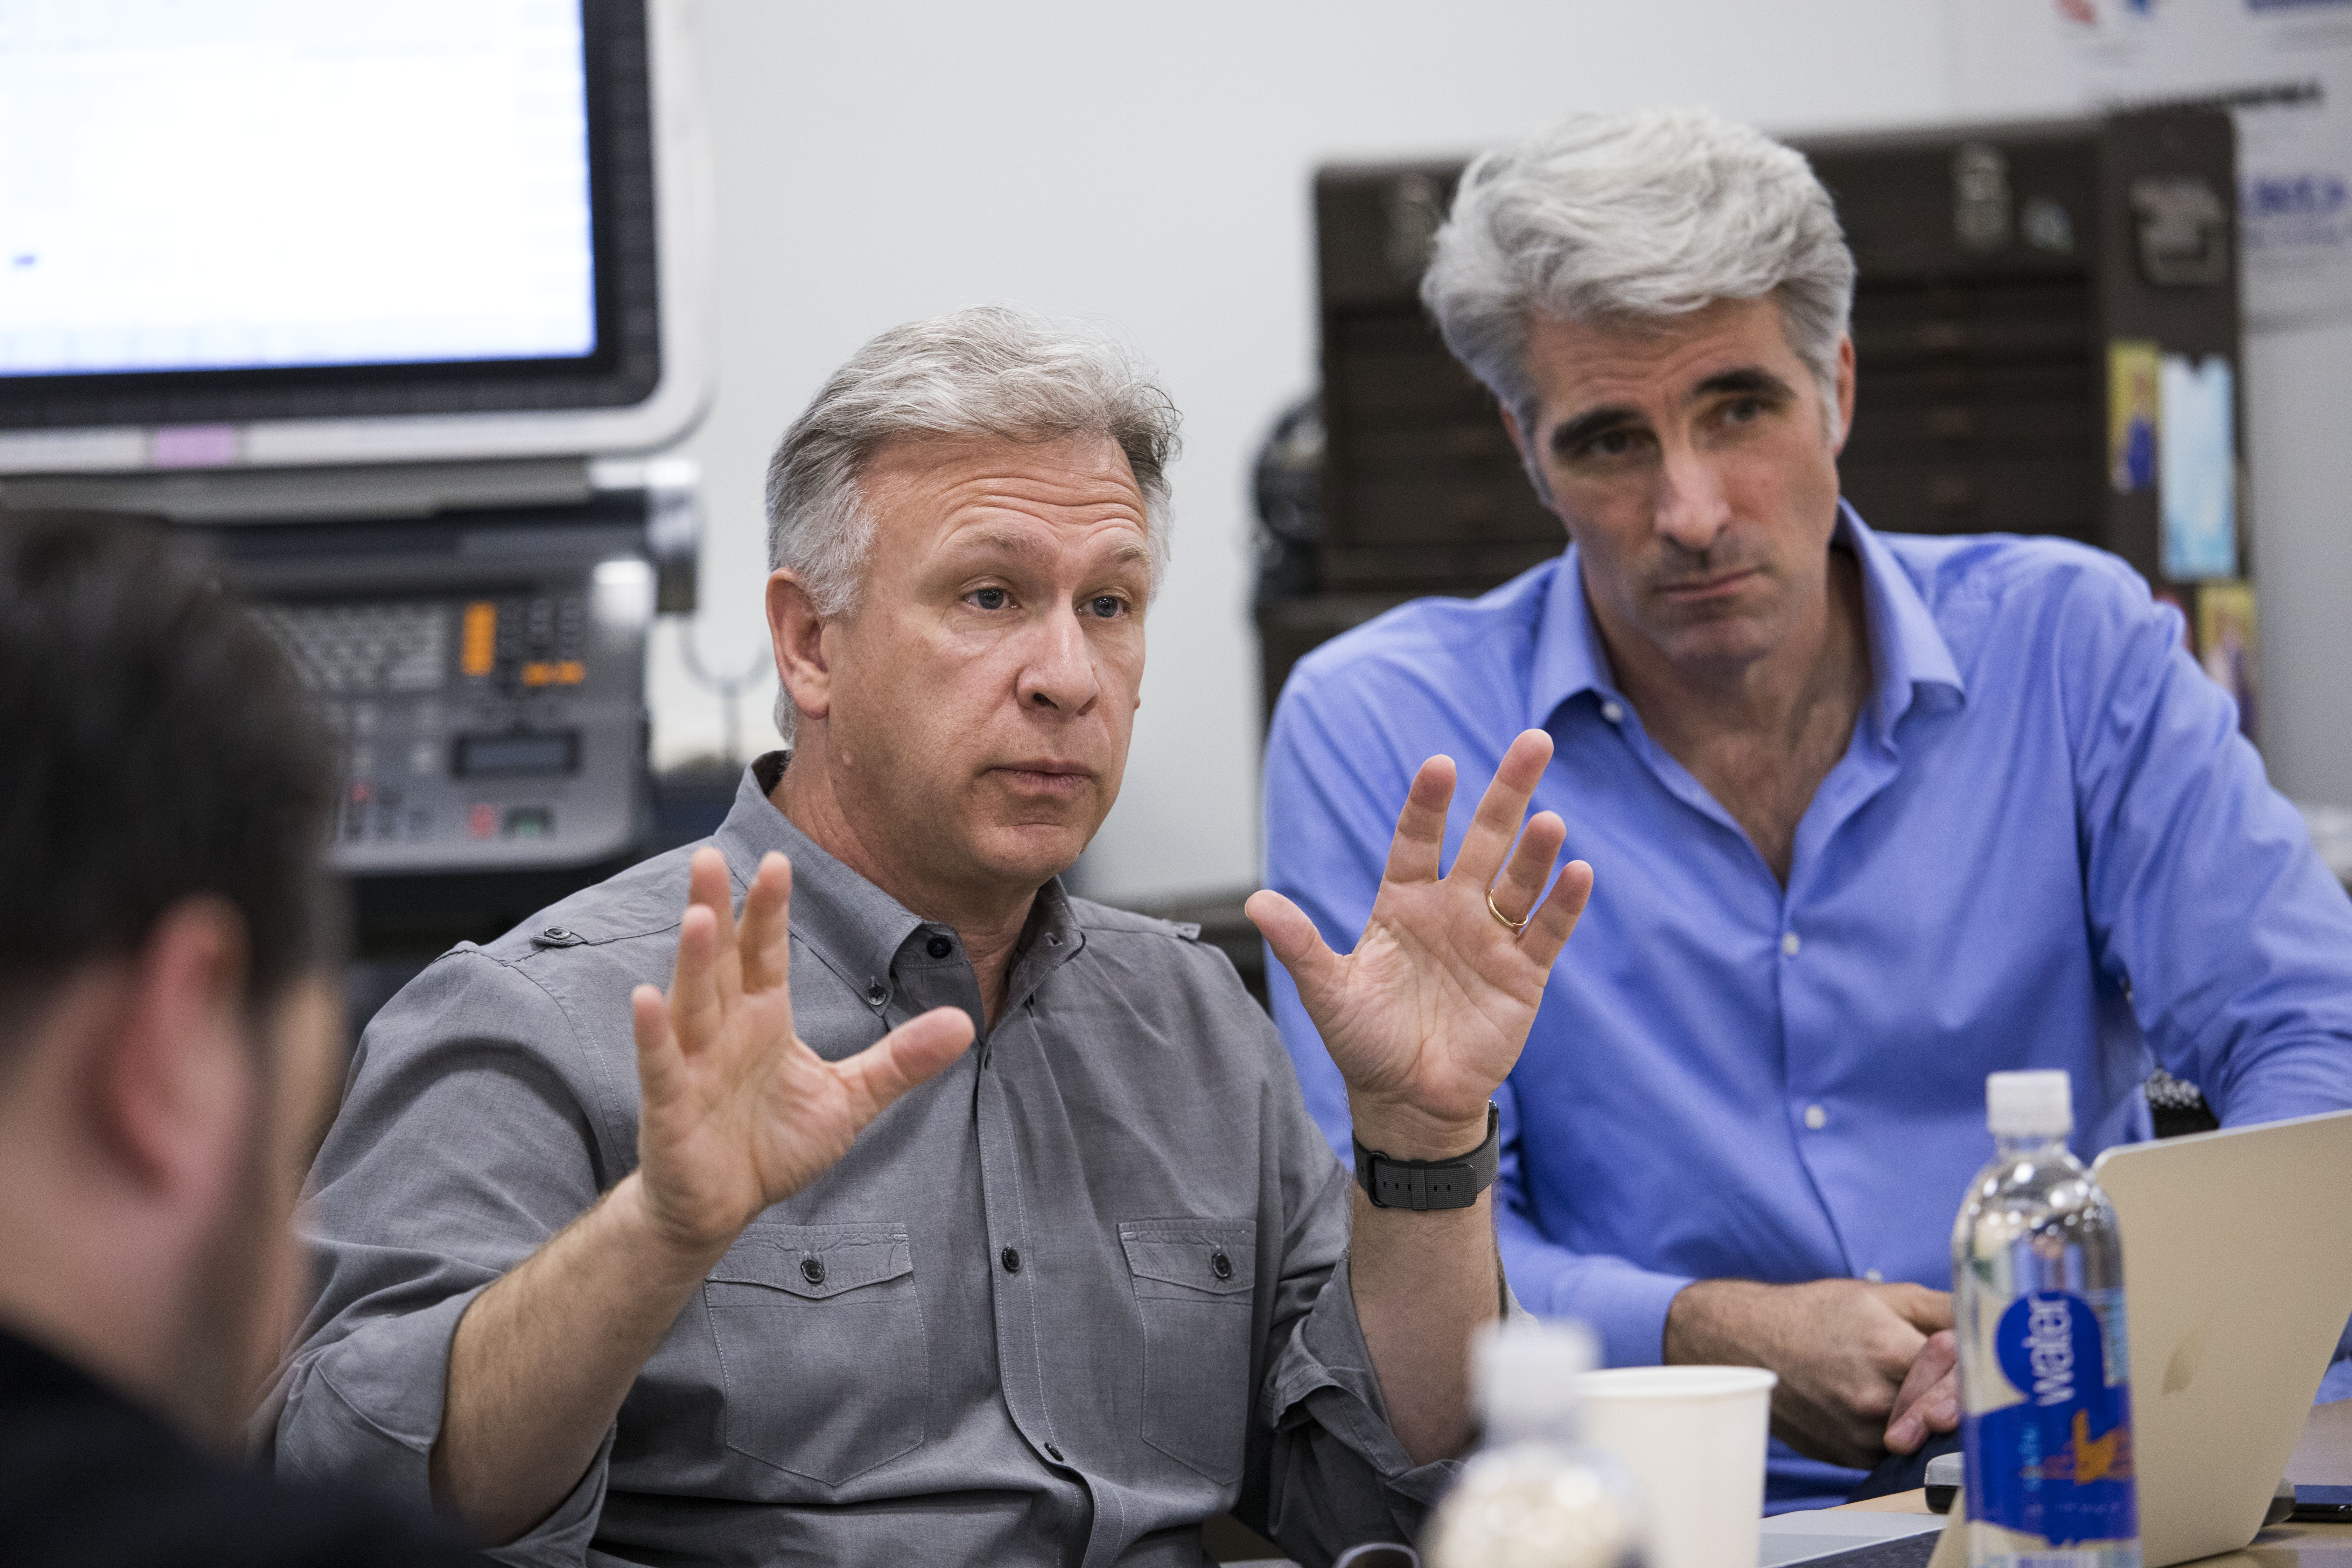 Transcript Phil Schiller Craig Federighi And John Ternus On The State Of Apple S Pro Macs Techcrunch